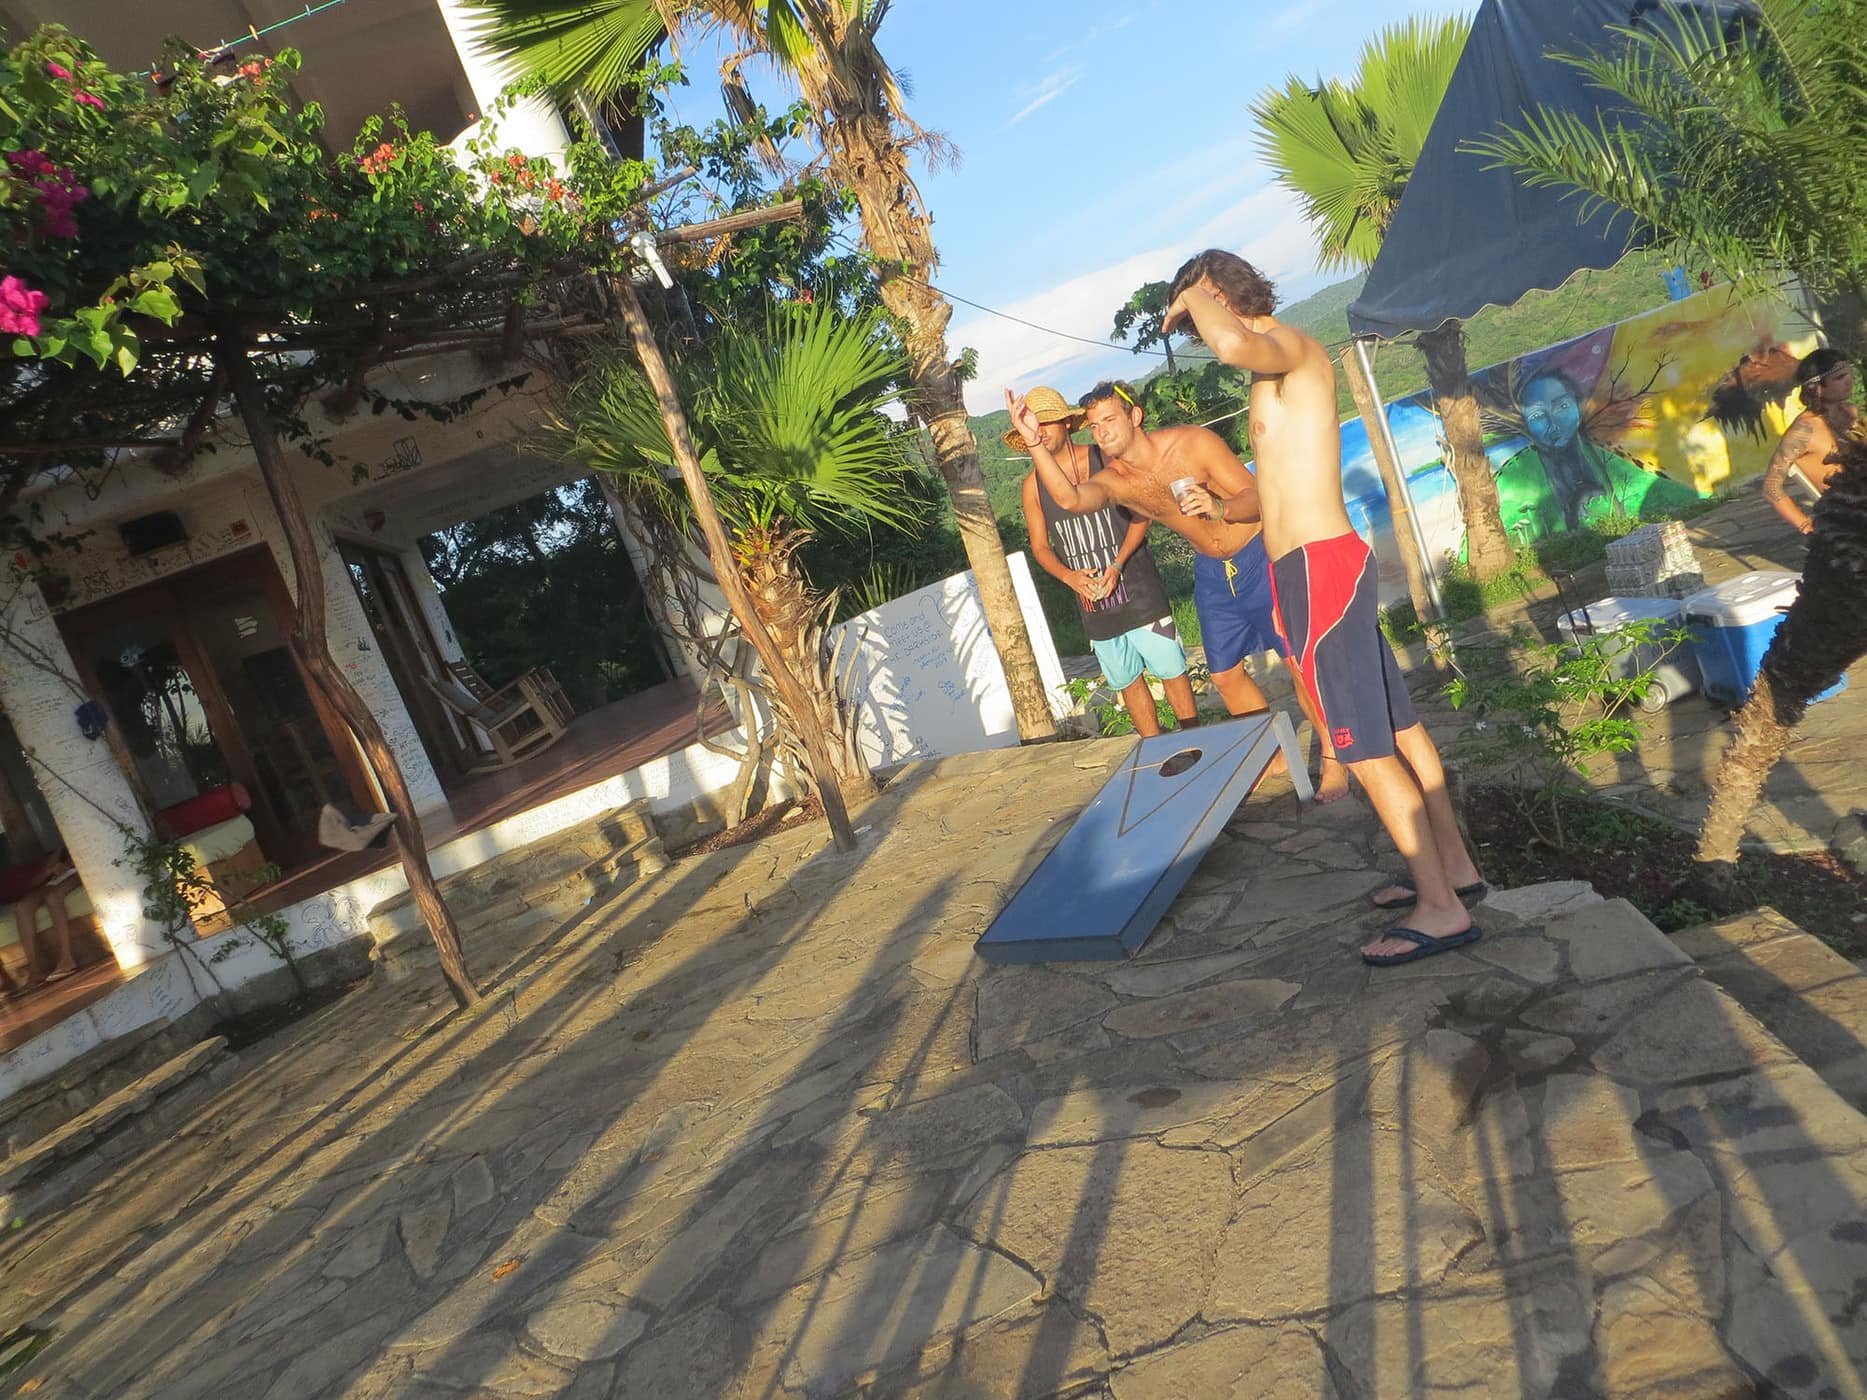 Playing bags at the Sunday Funday Pool Crawl in San Juan Del Sur, Nicaragua